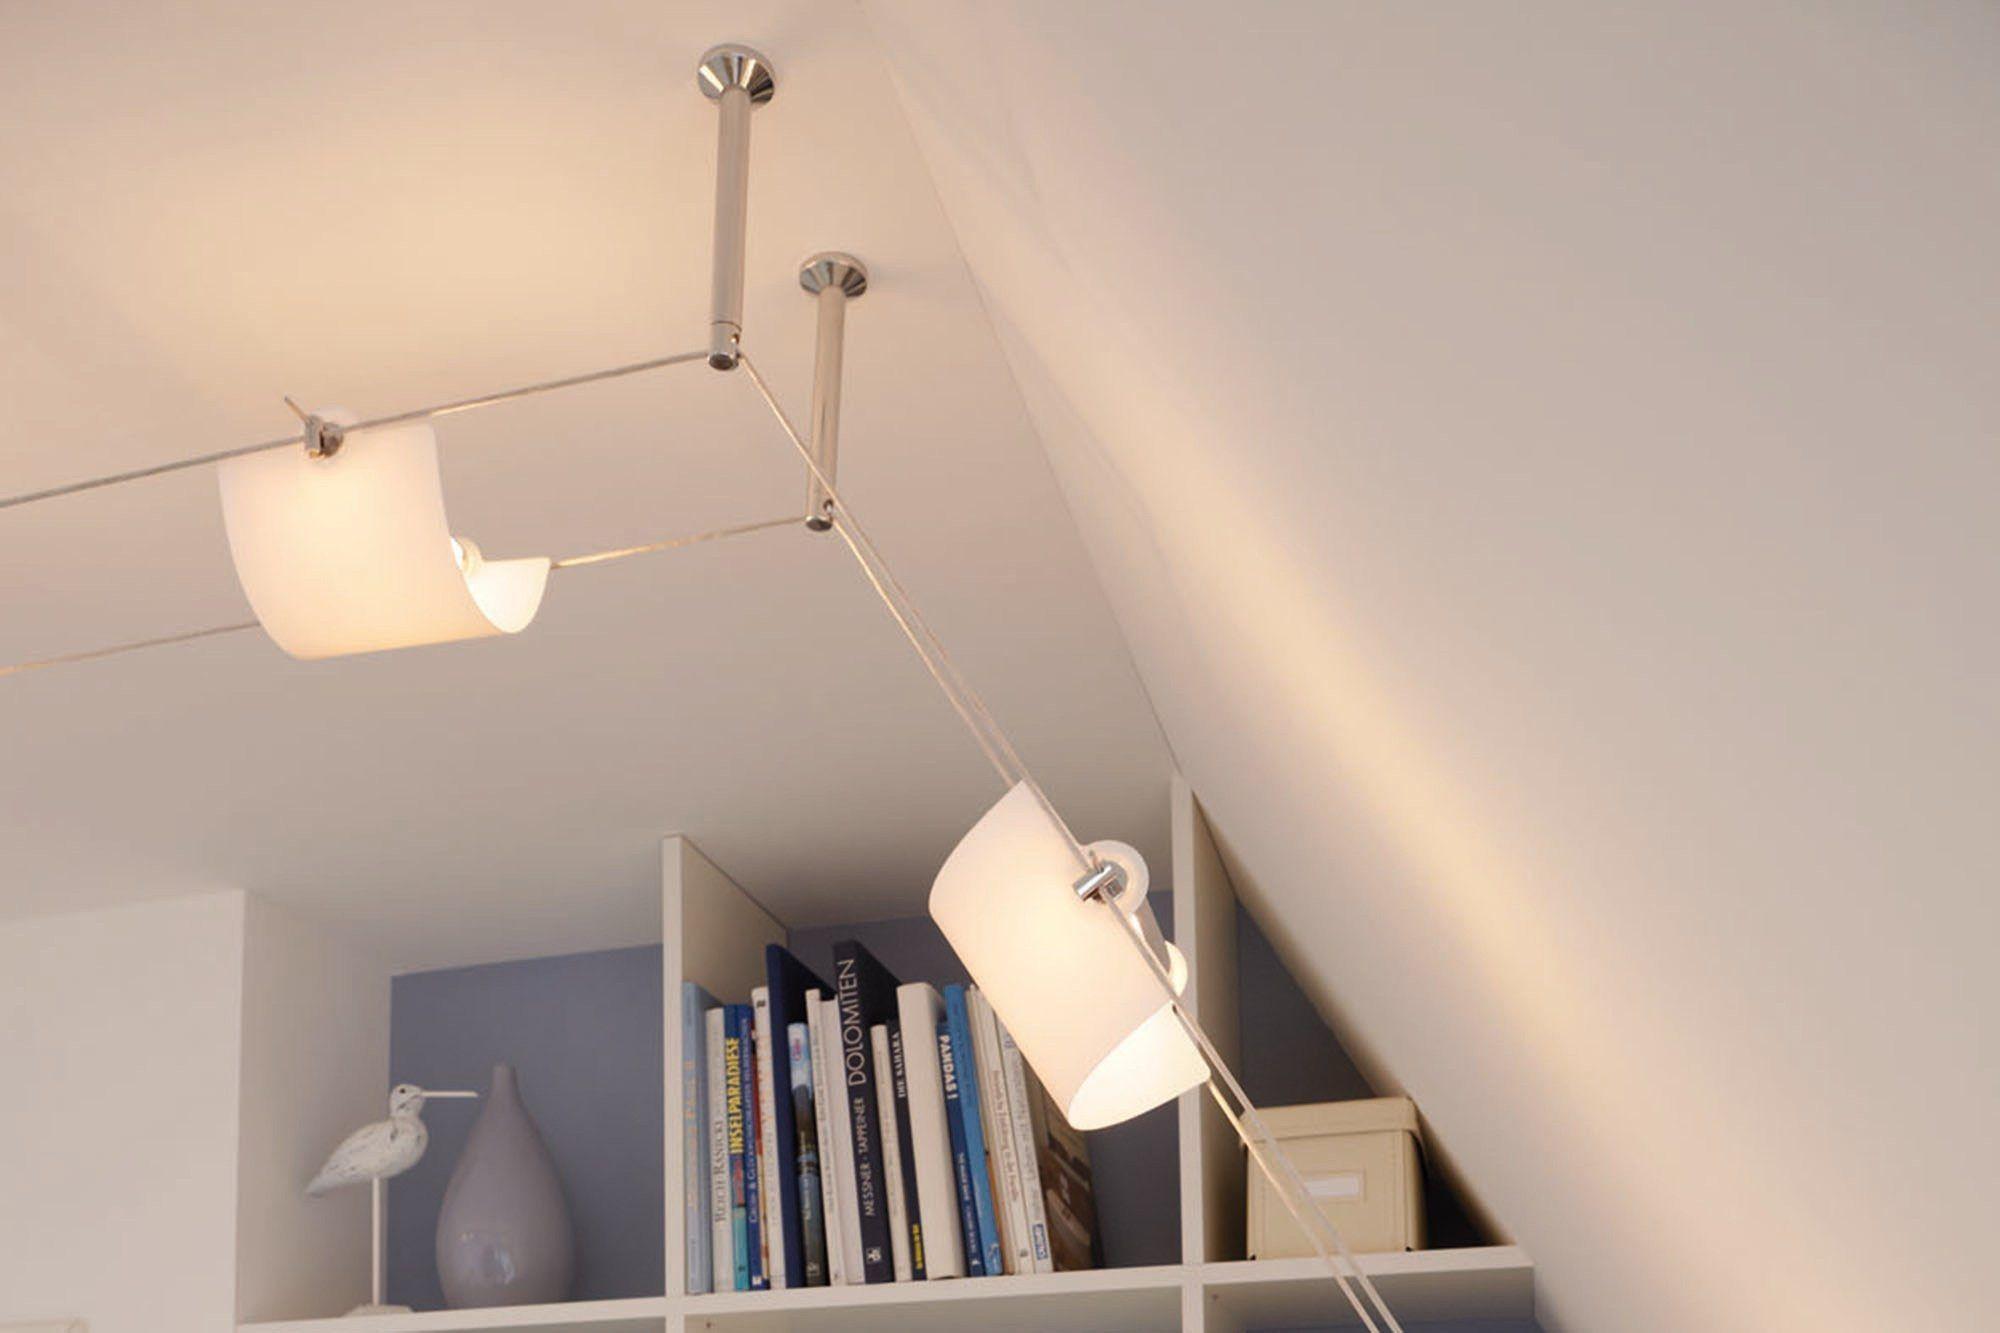 badezimmer lampe ohne strom  beleuchtungsideen led